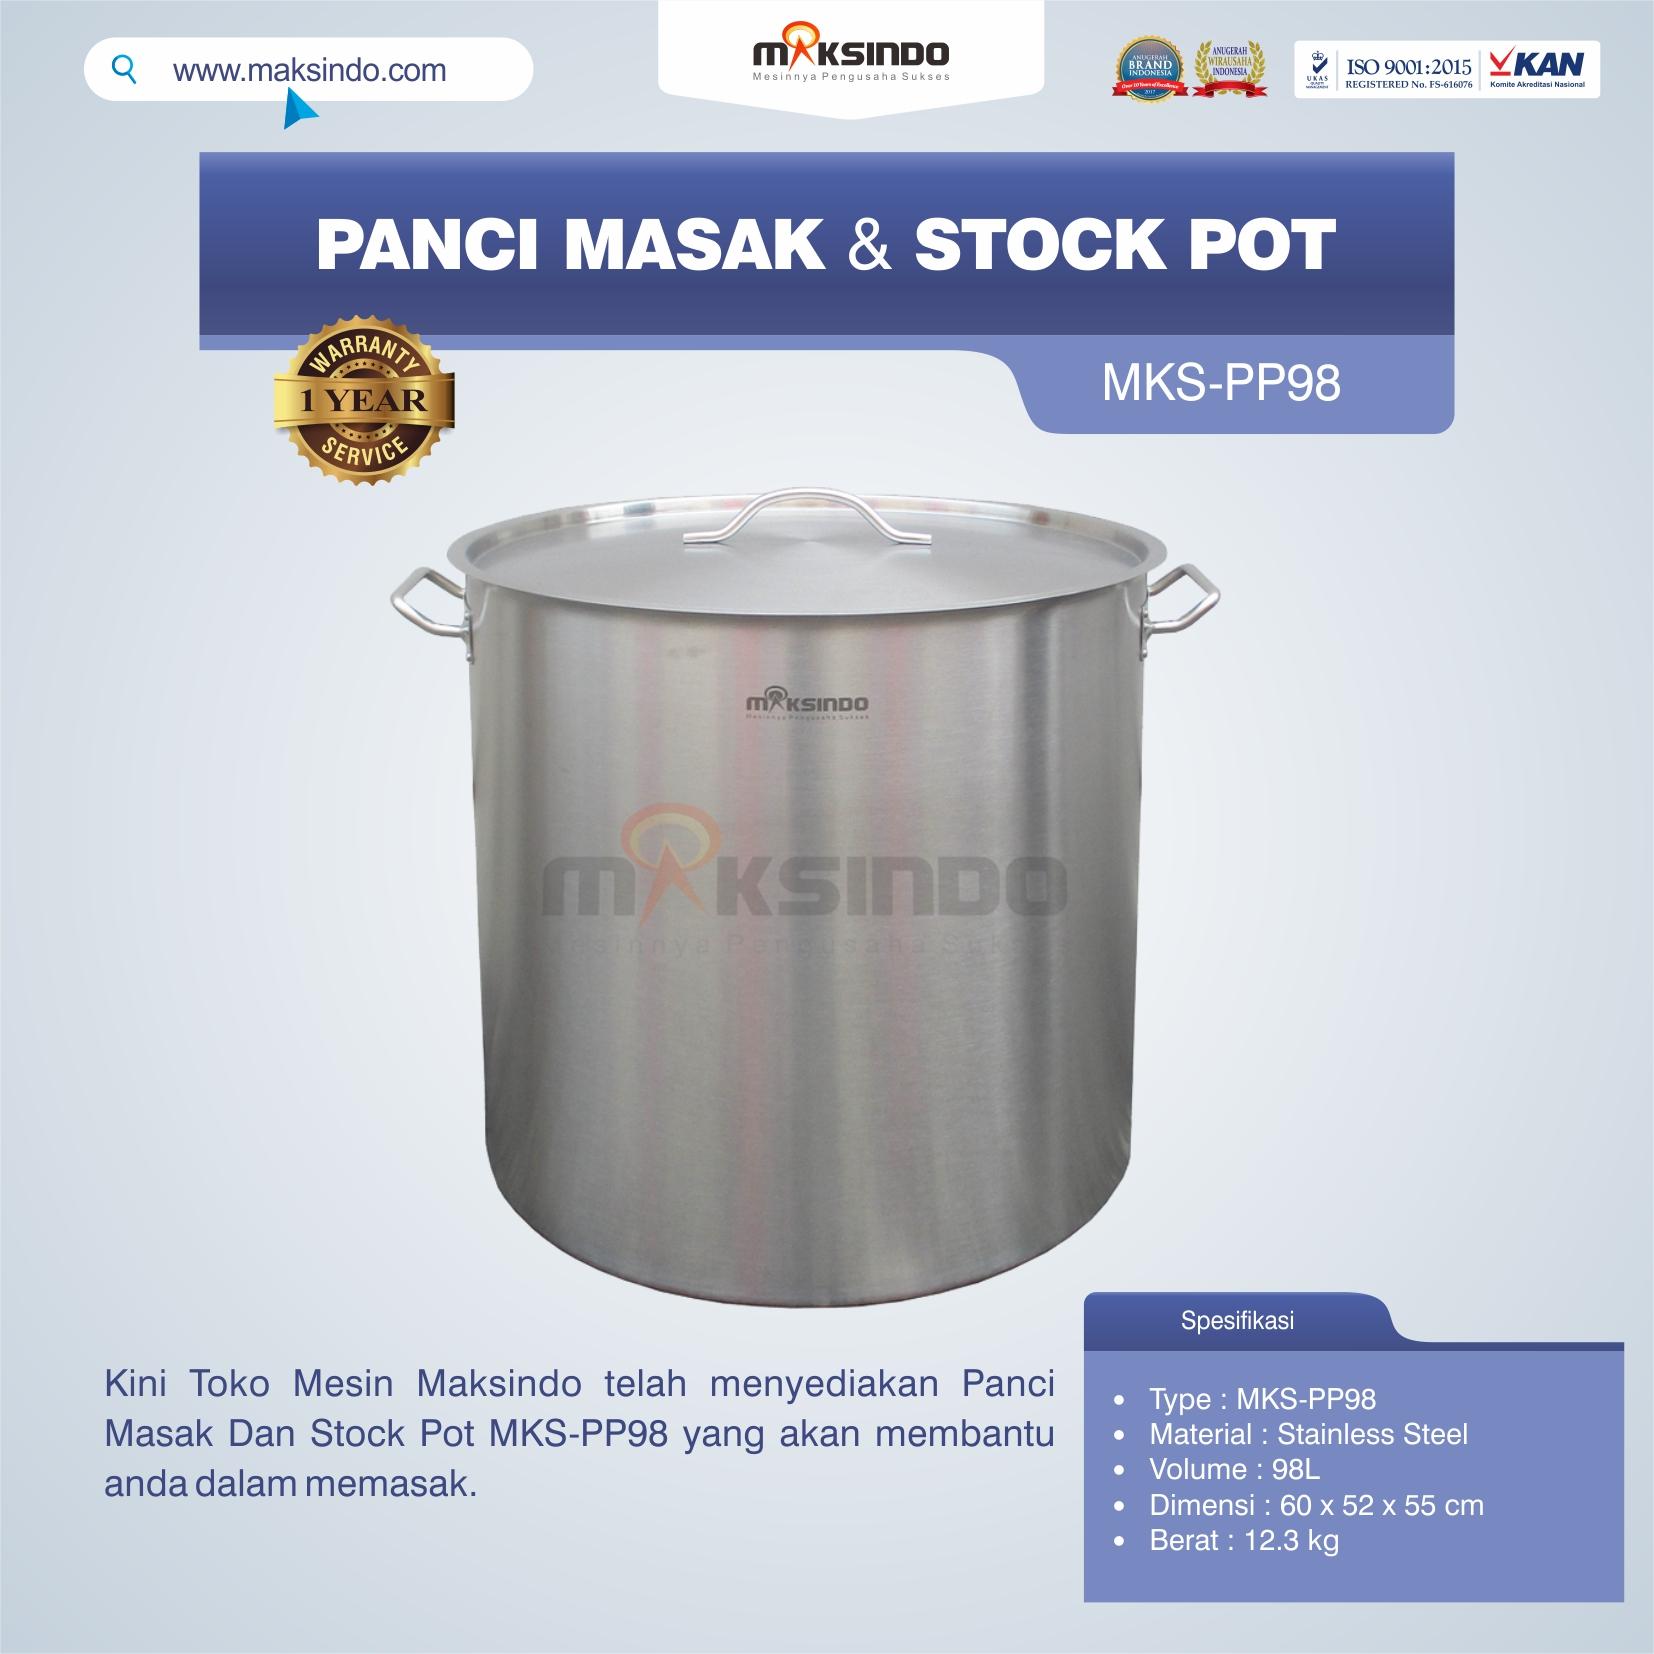 Panci Masak Dan Stock Pot MKS-PP98